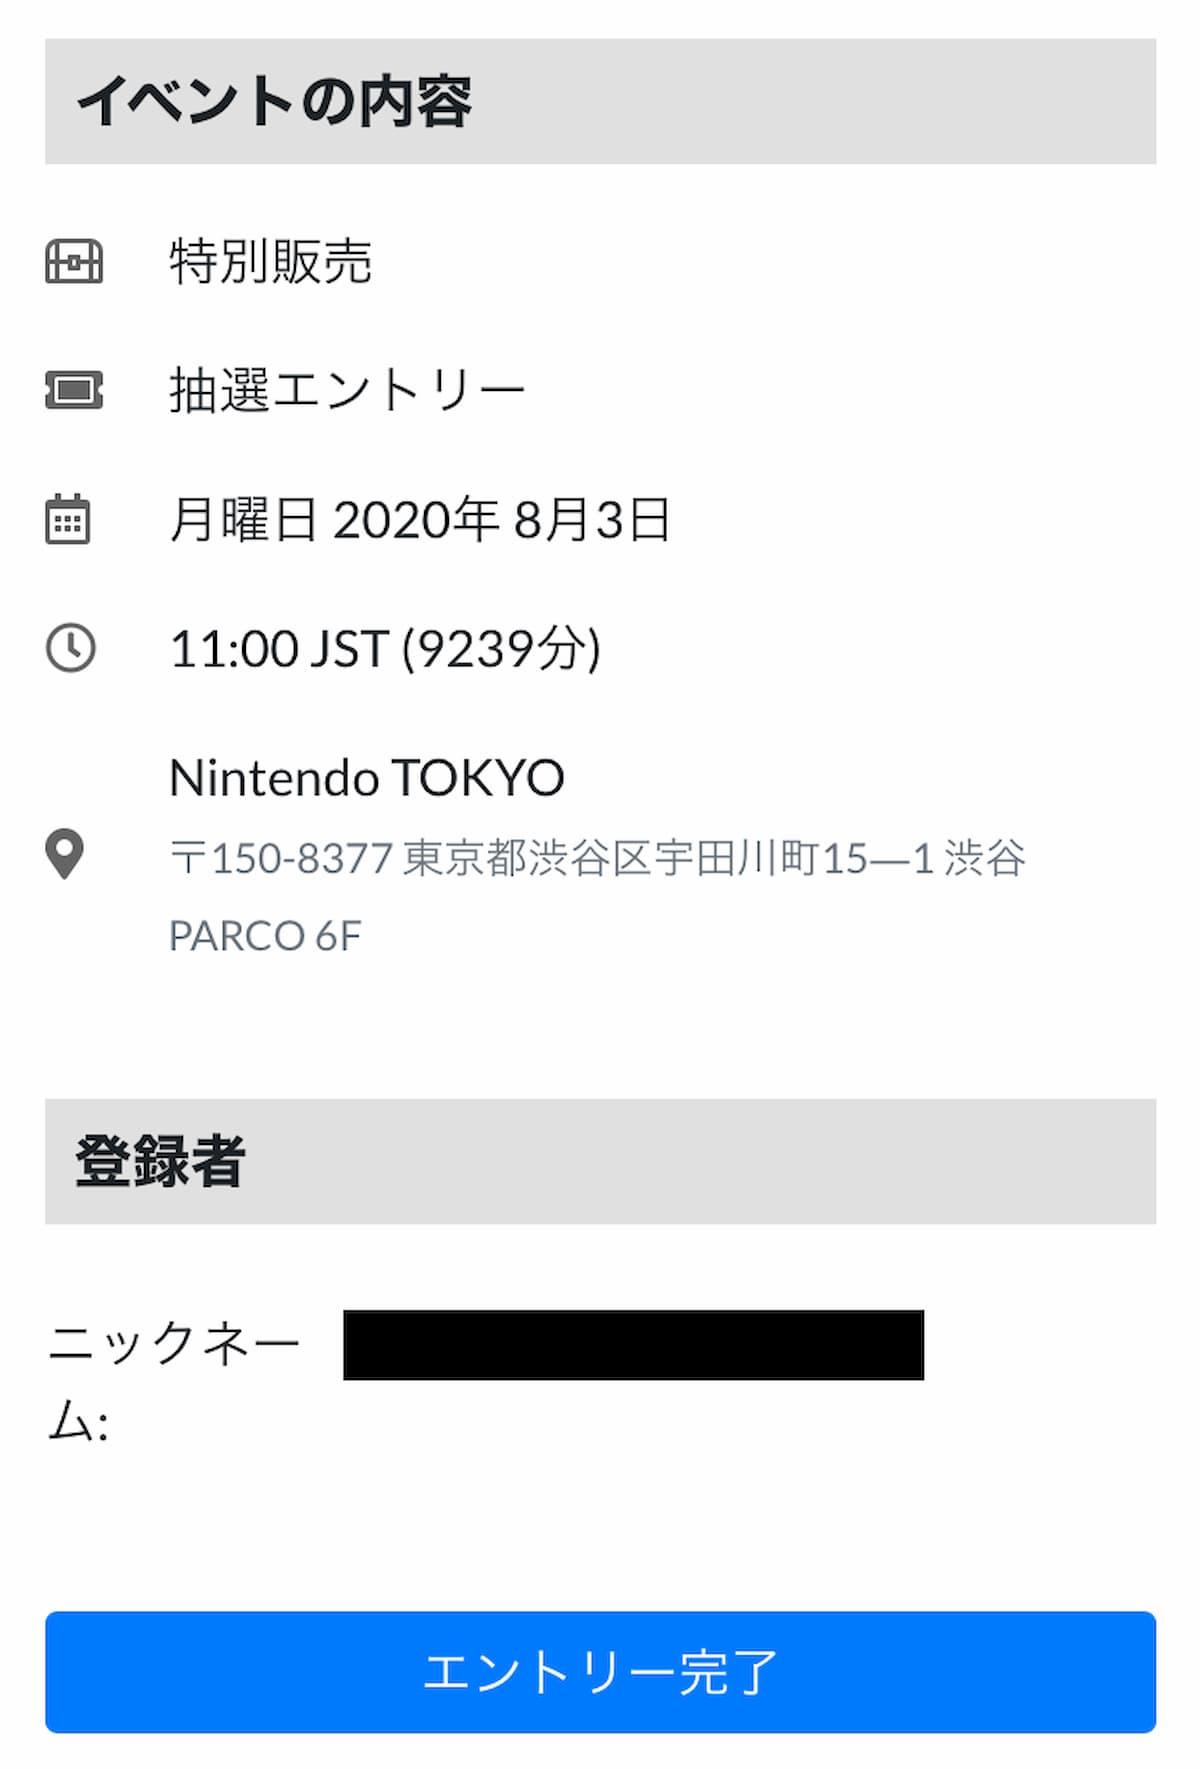 Nintendo TOKYO抽選販売